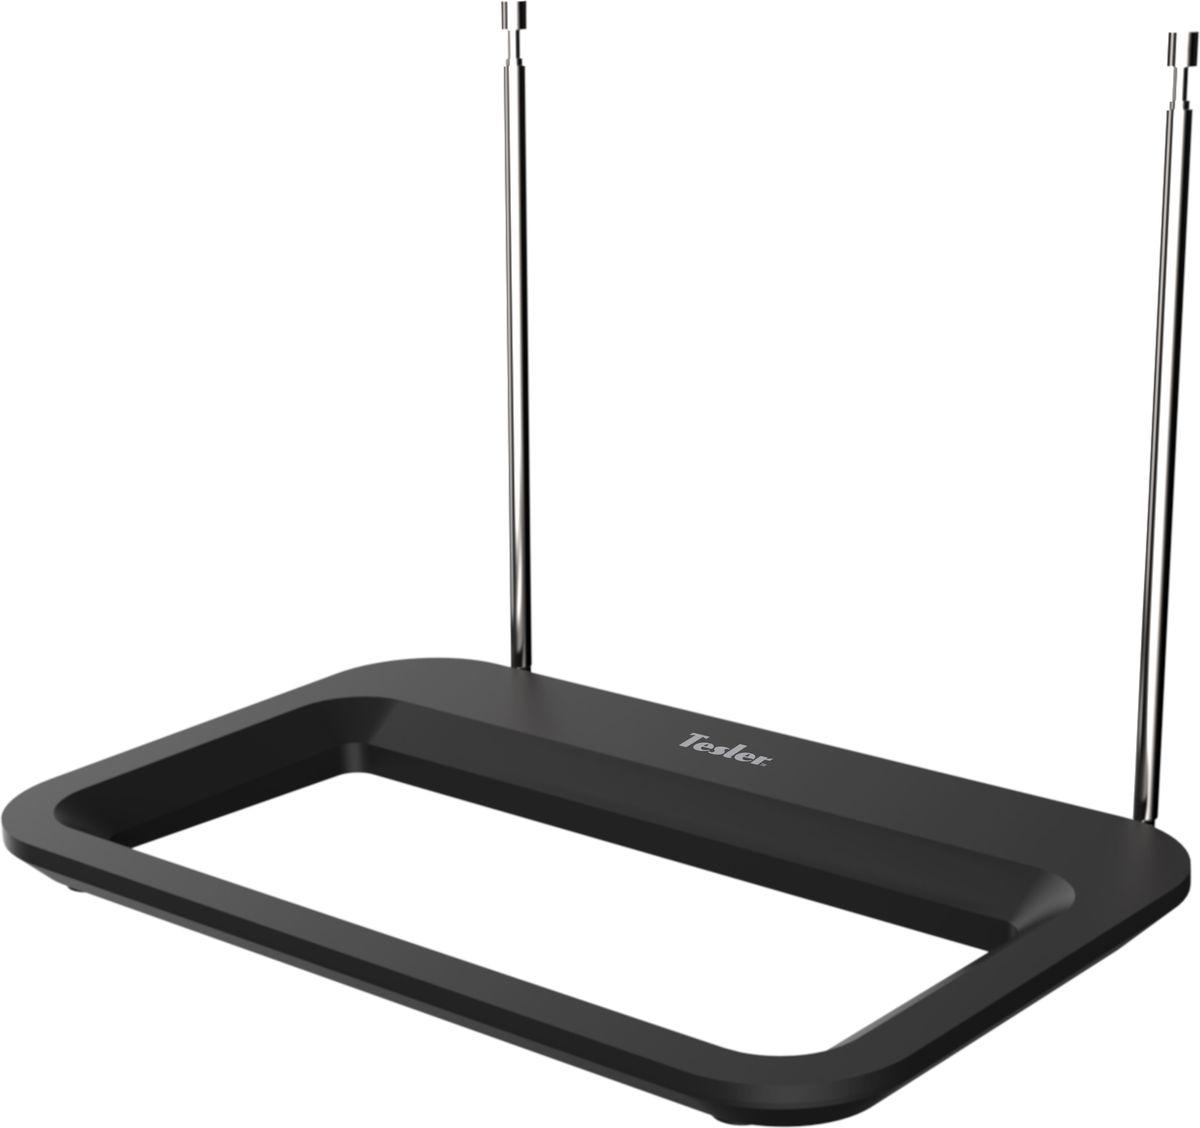 Tesler IDA-150 комнатная ТВ антенна (активная) - Антенны